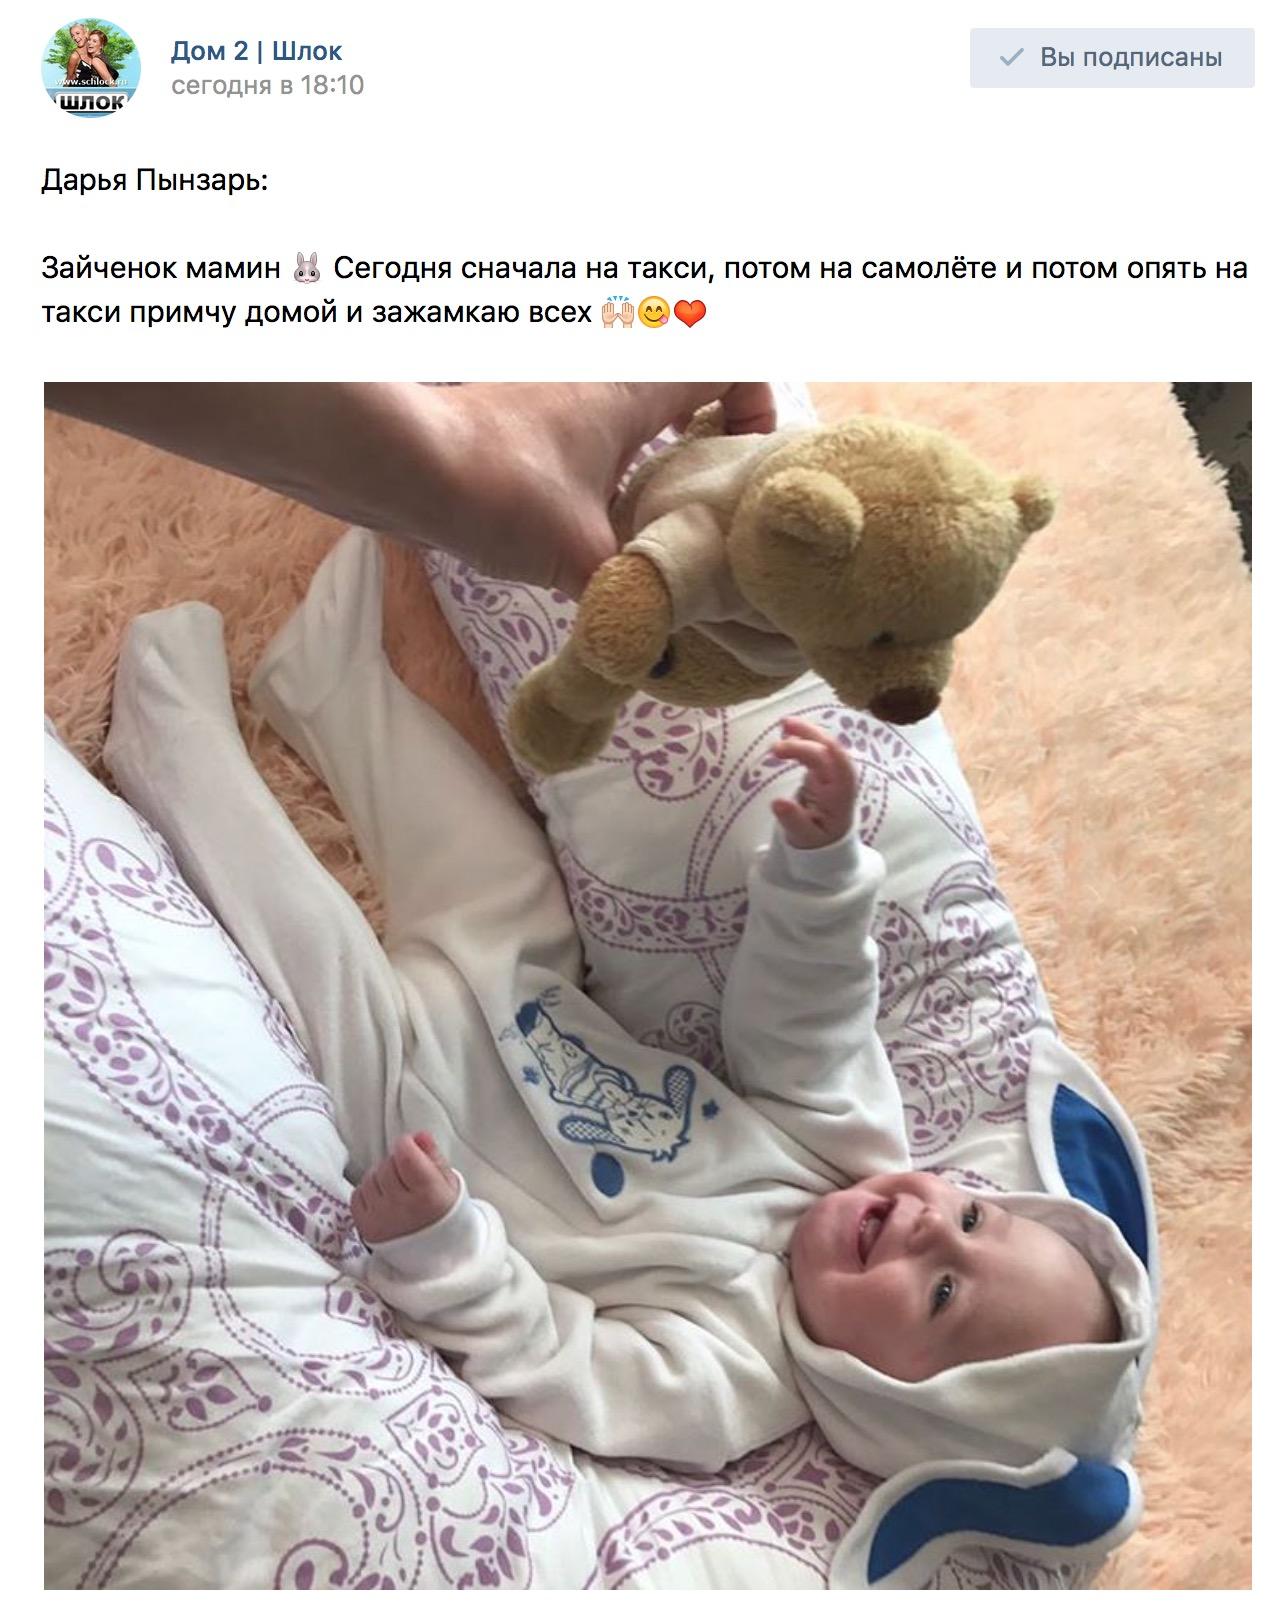 Дарья Пынзарь. Зайчонок мамин ?